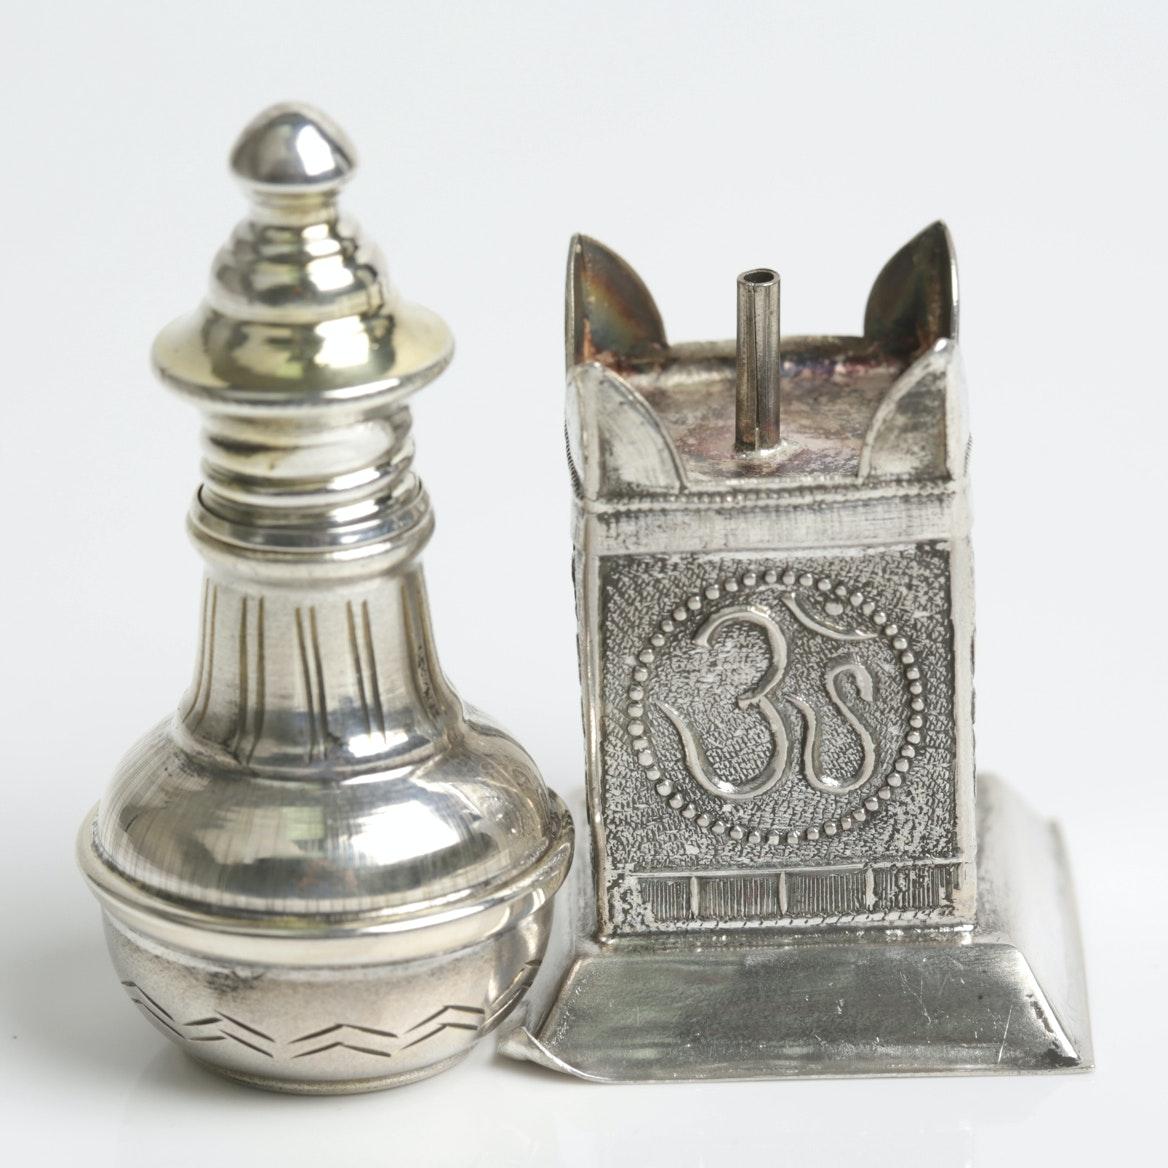 990 Silver Trinkets